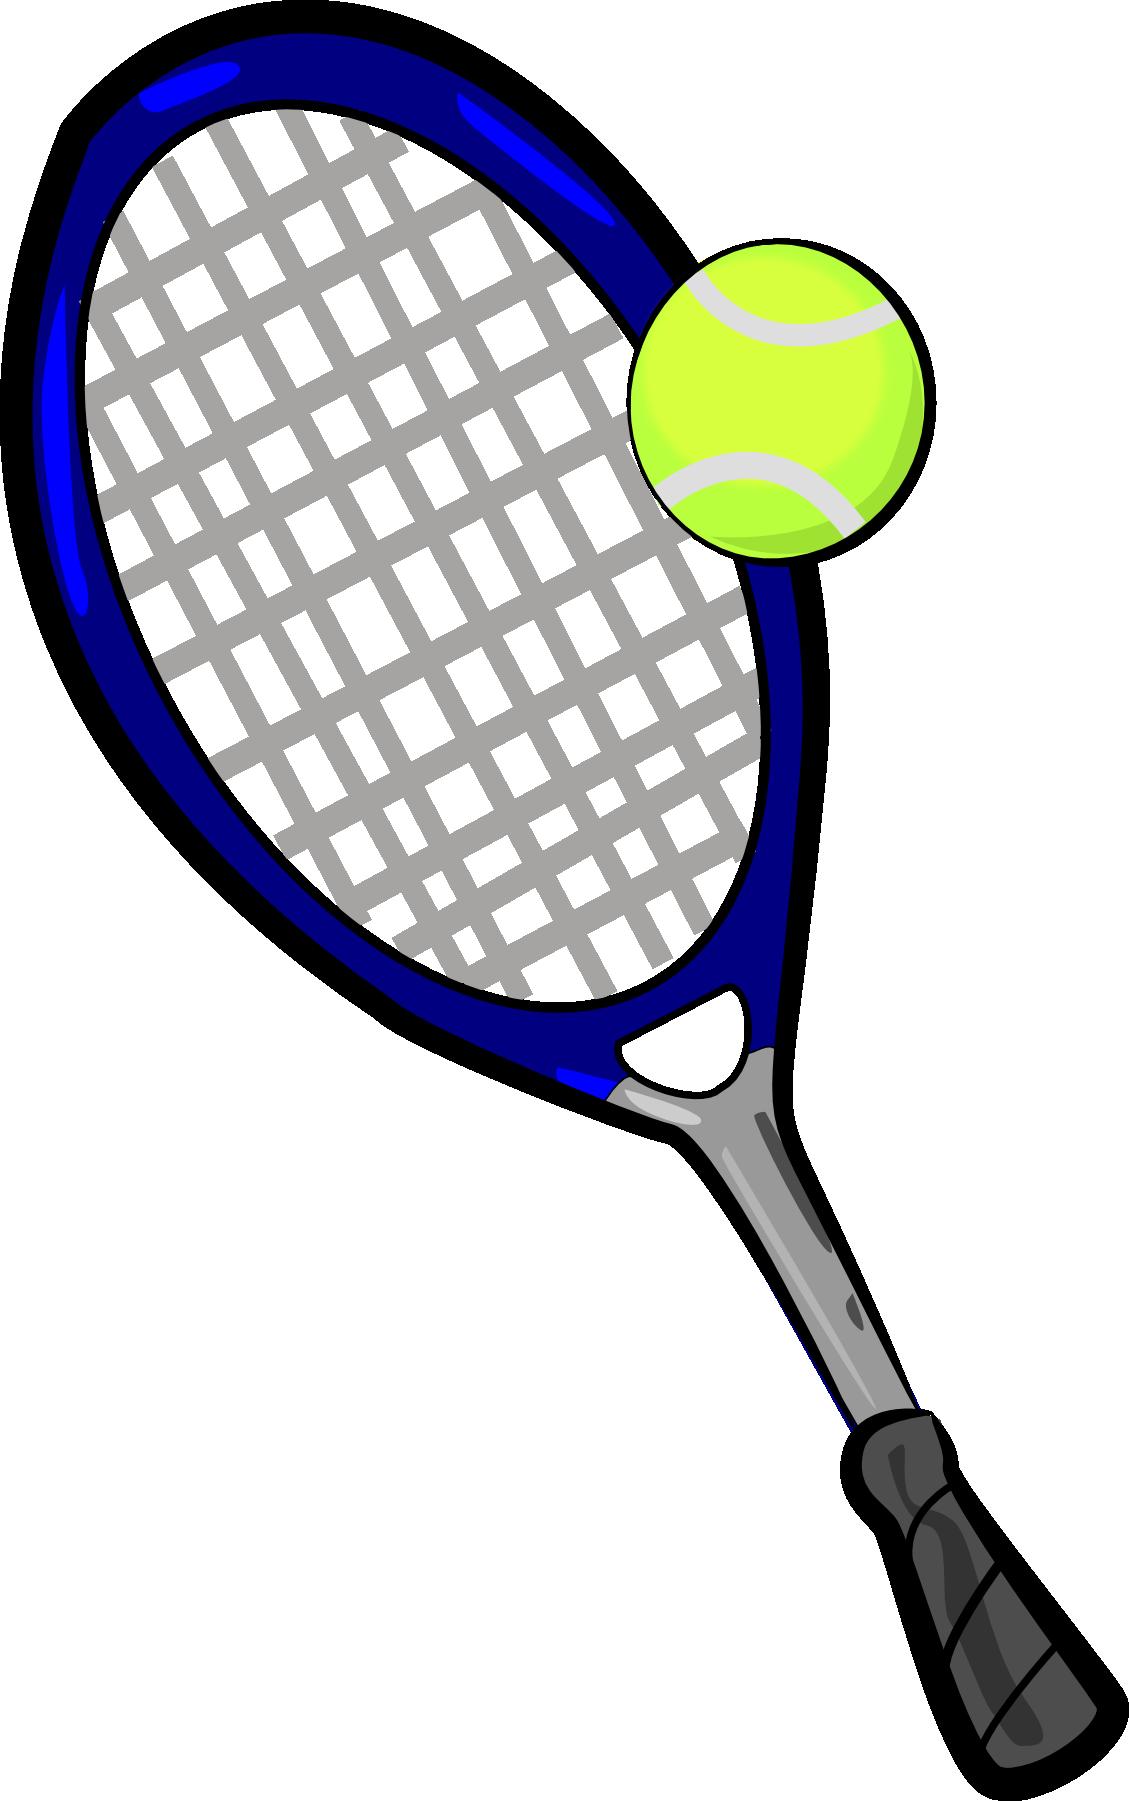 tennis ball clipart-tennis ball clipart-10